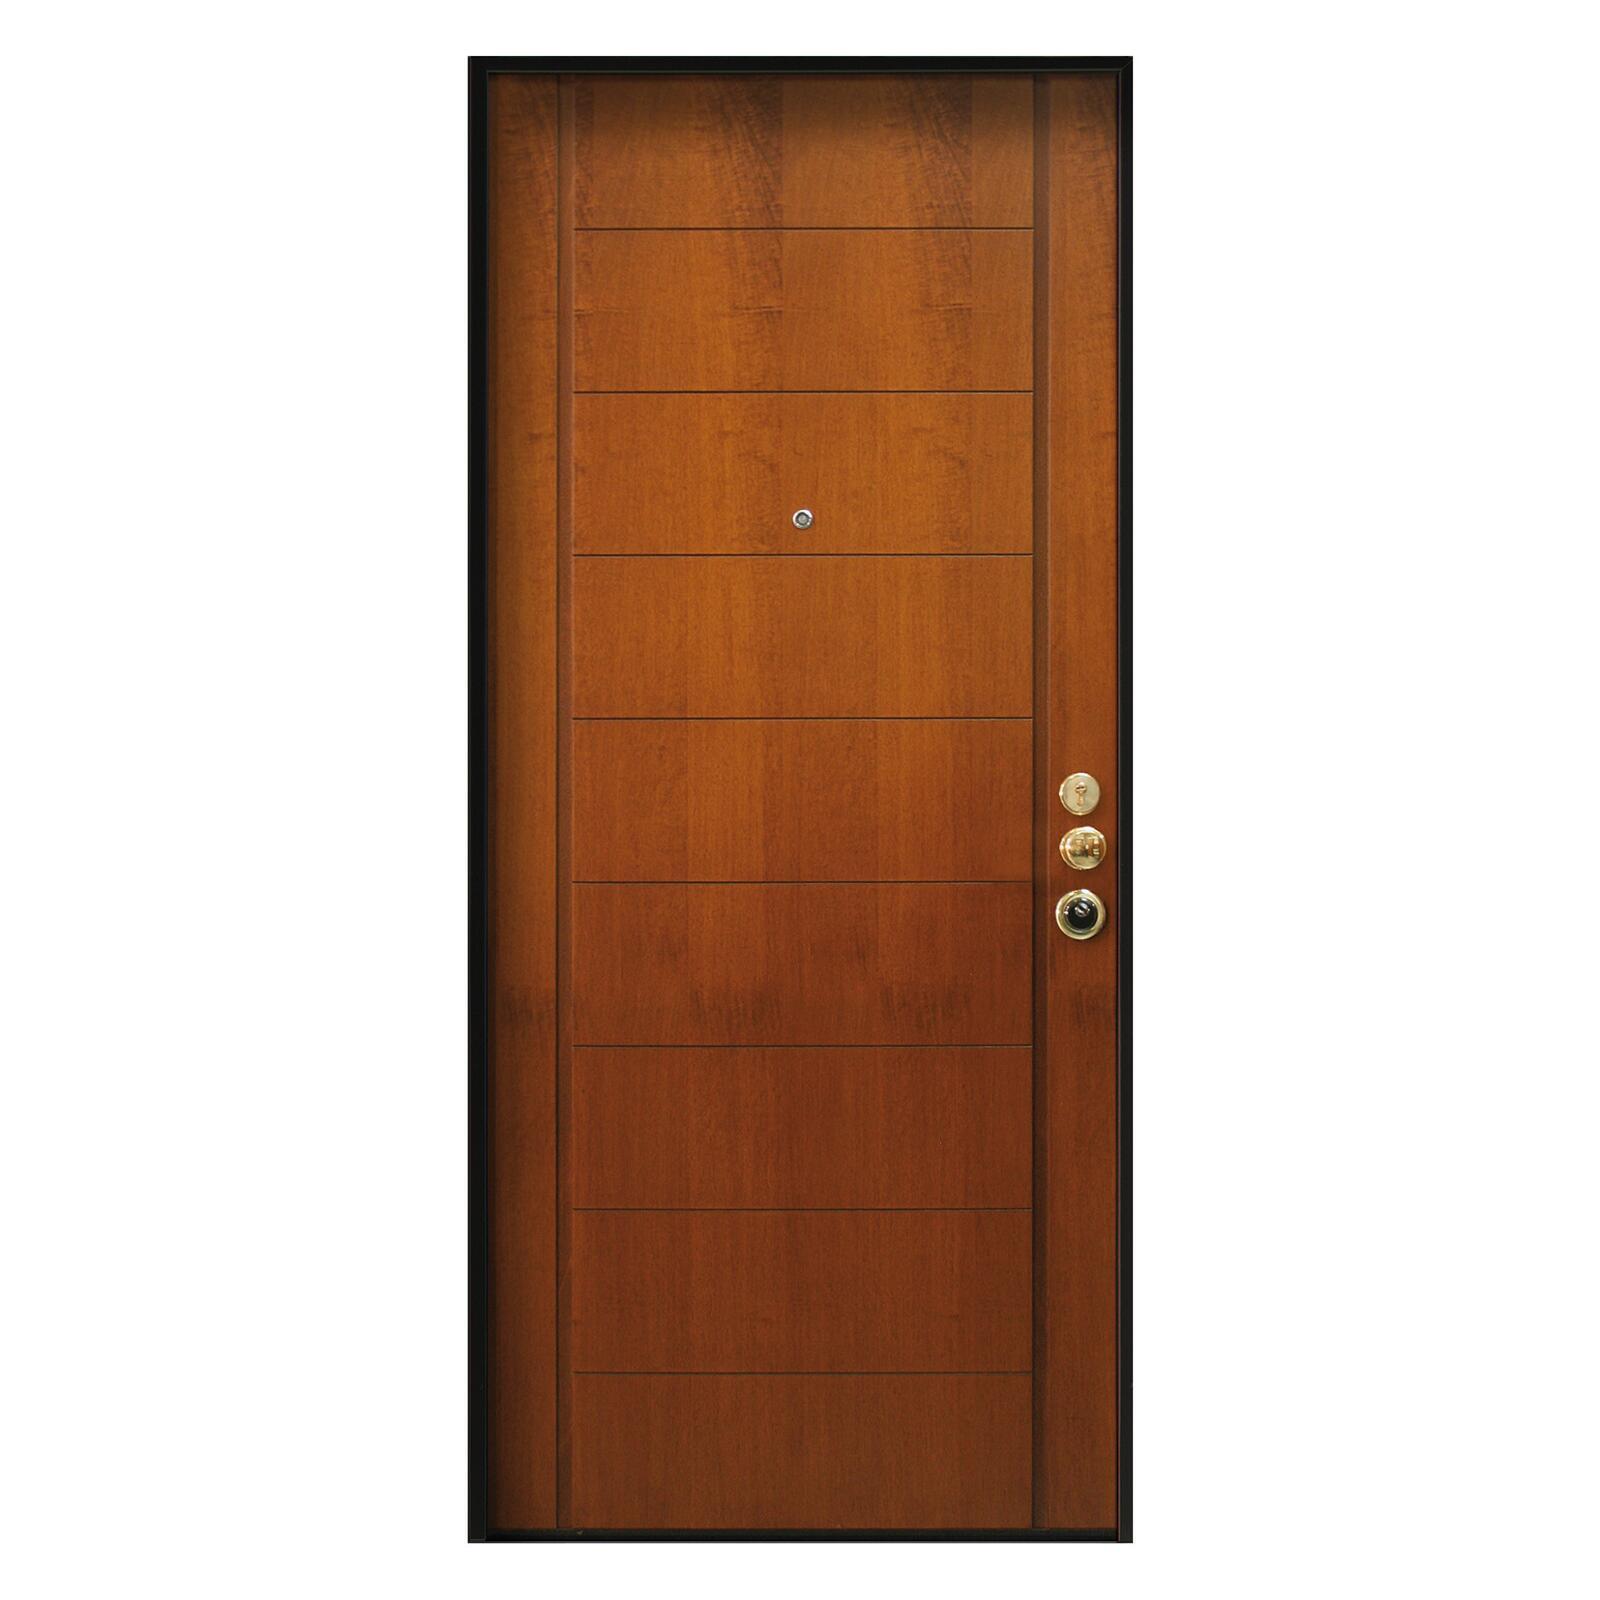 Porta blindata Best noce L 80 x H 210 cm sinistra - 3